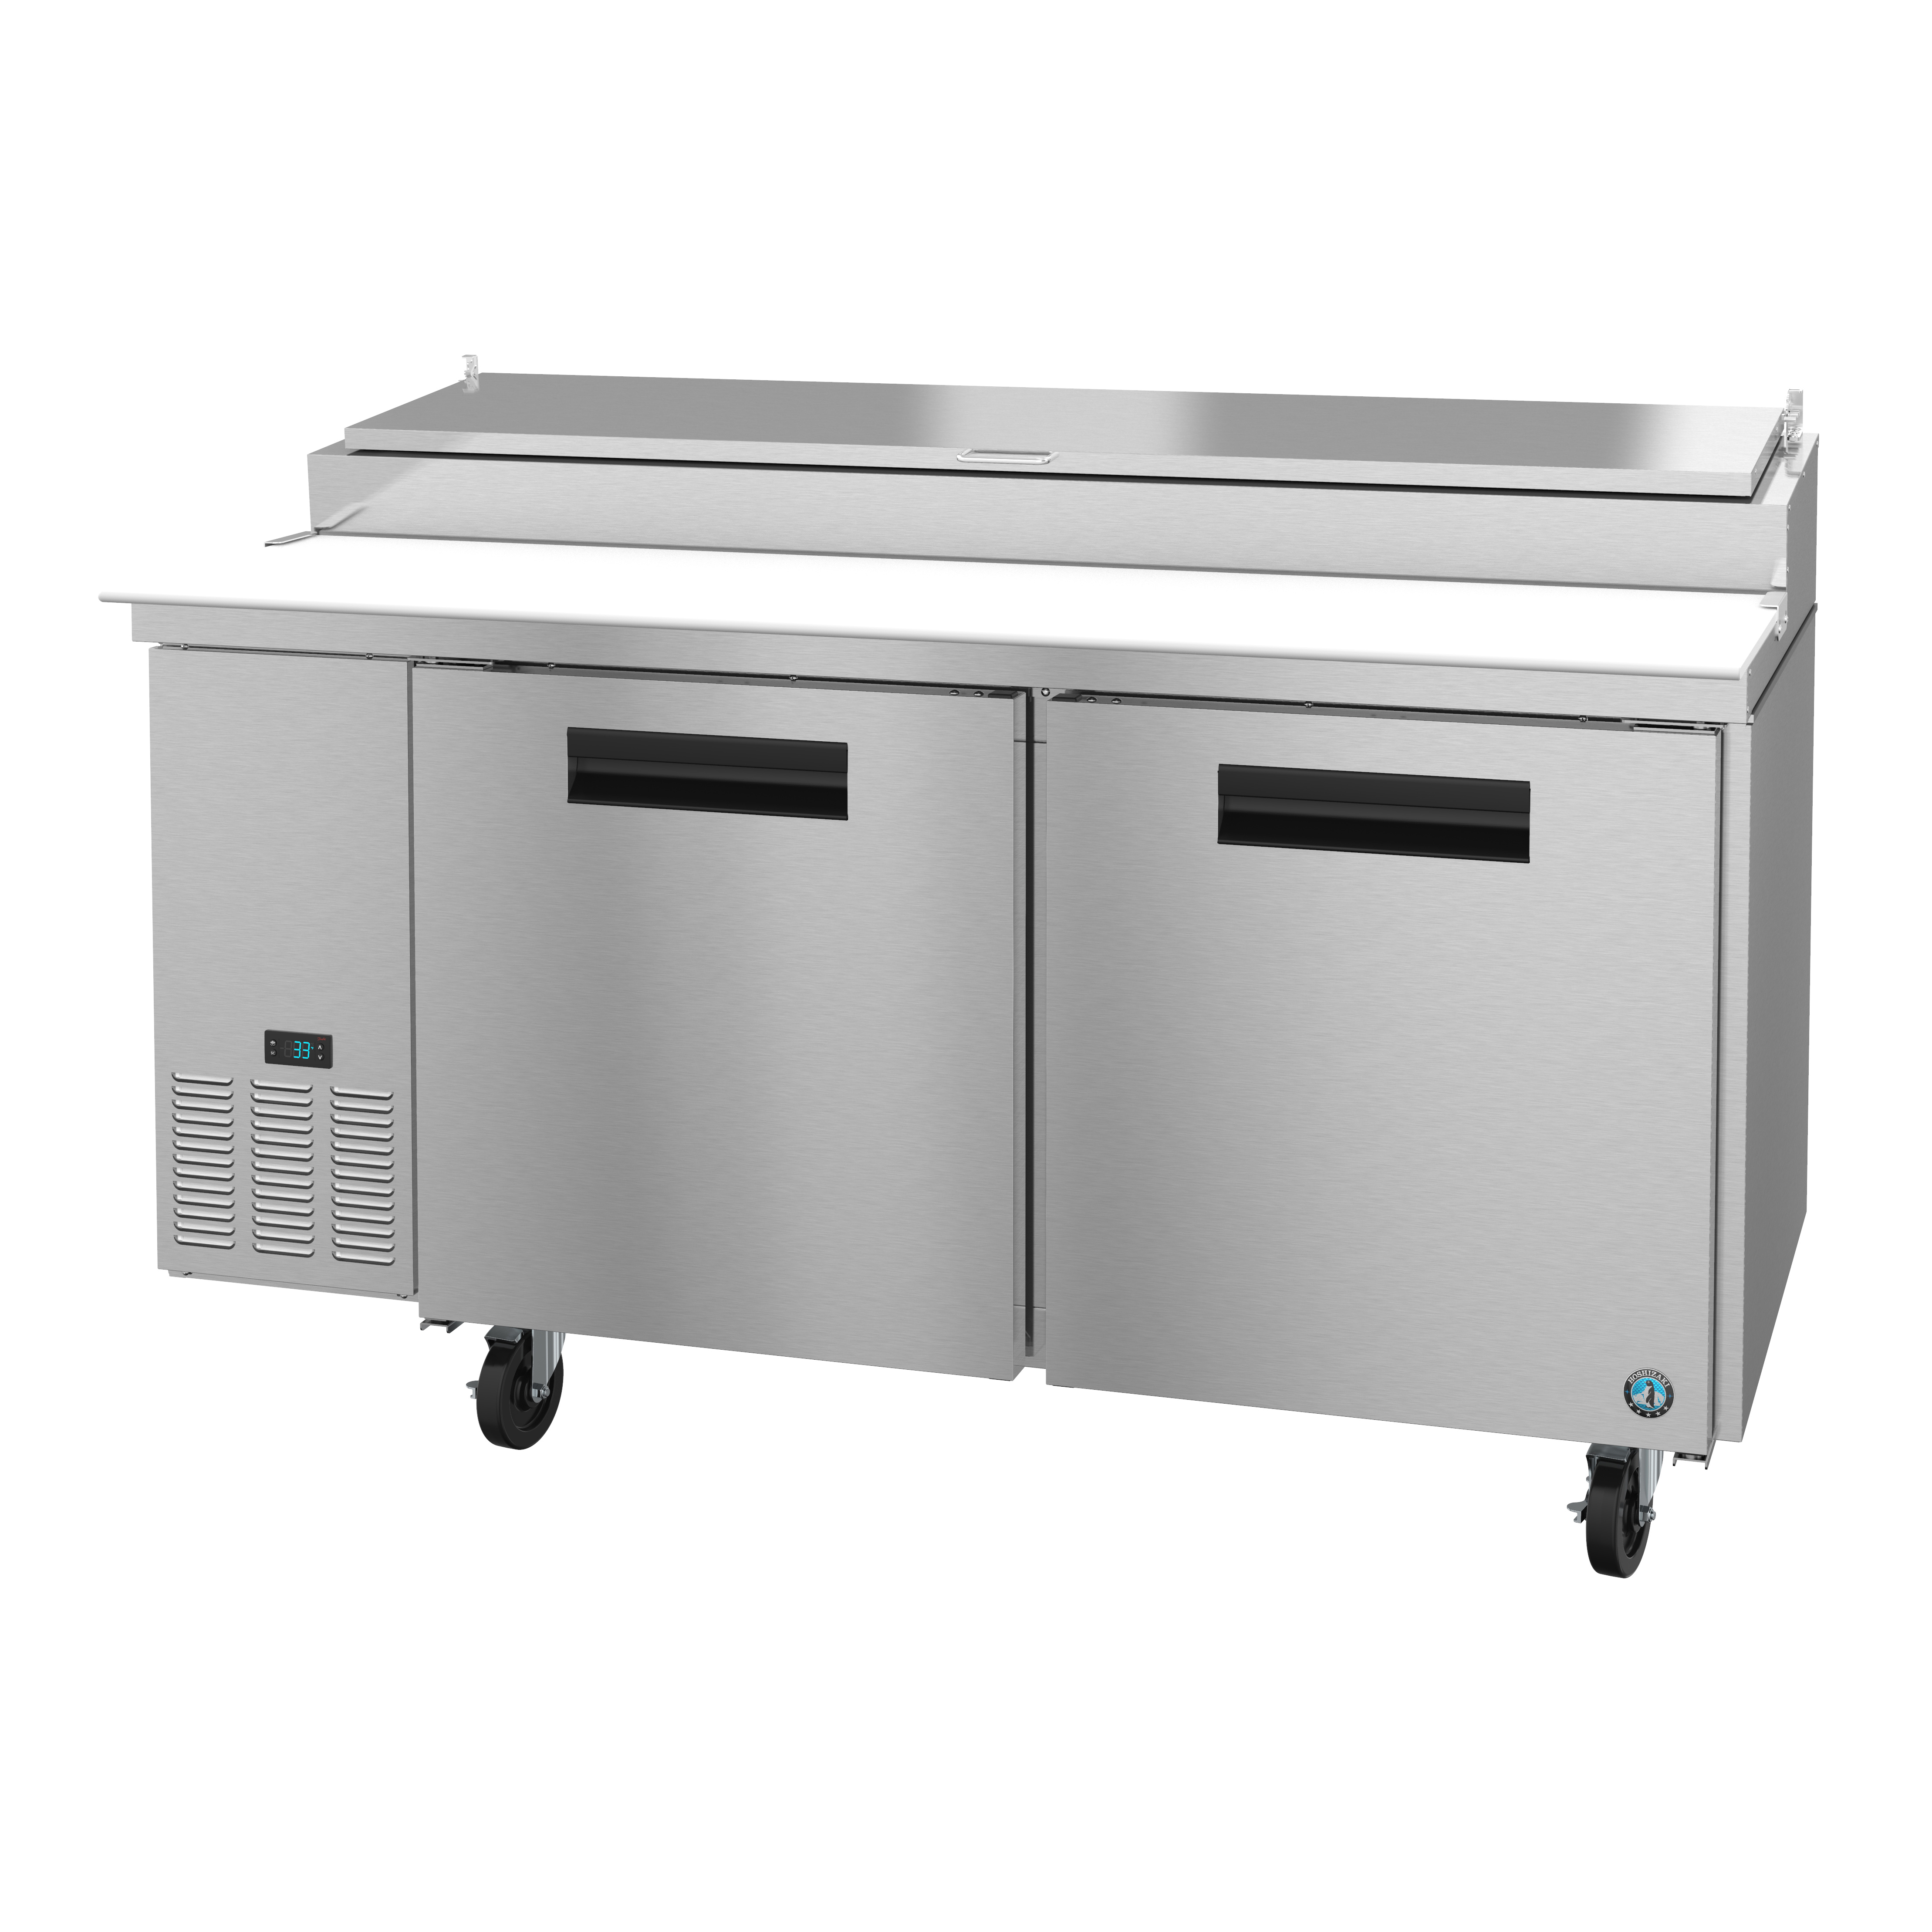 Hoshizaki PR67A refrigerated counter, pizza prep table